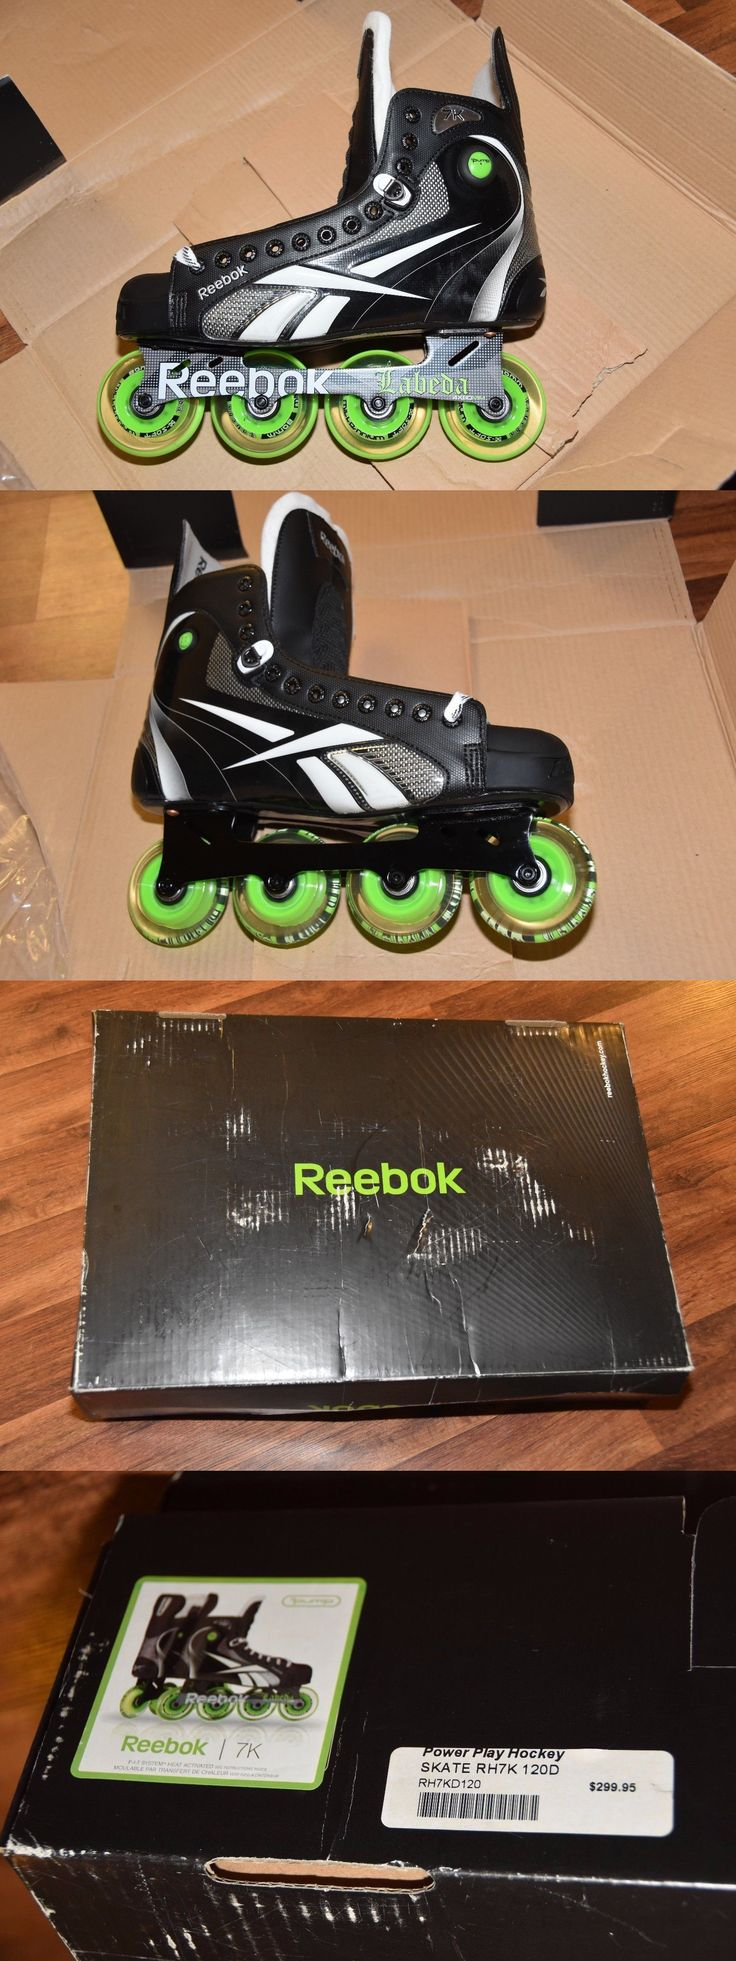 Roller Hockey 64669: Brand New Size 12 Men S Reebok 7K Pump Inline Power Play Hockey Skates Labeda -> BUY IT NOW ONLY: $249.95 on eBay!